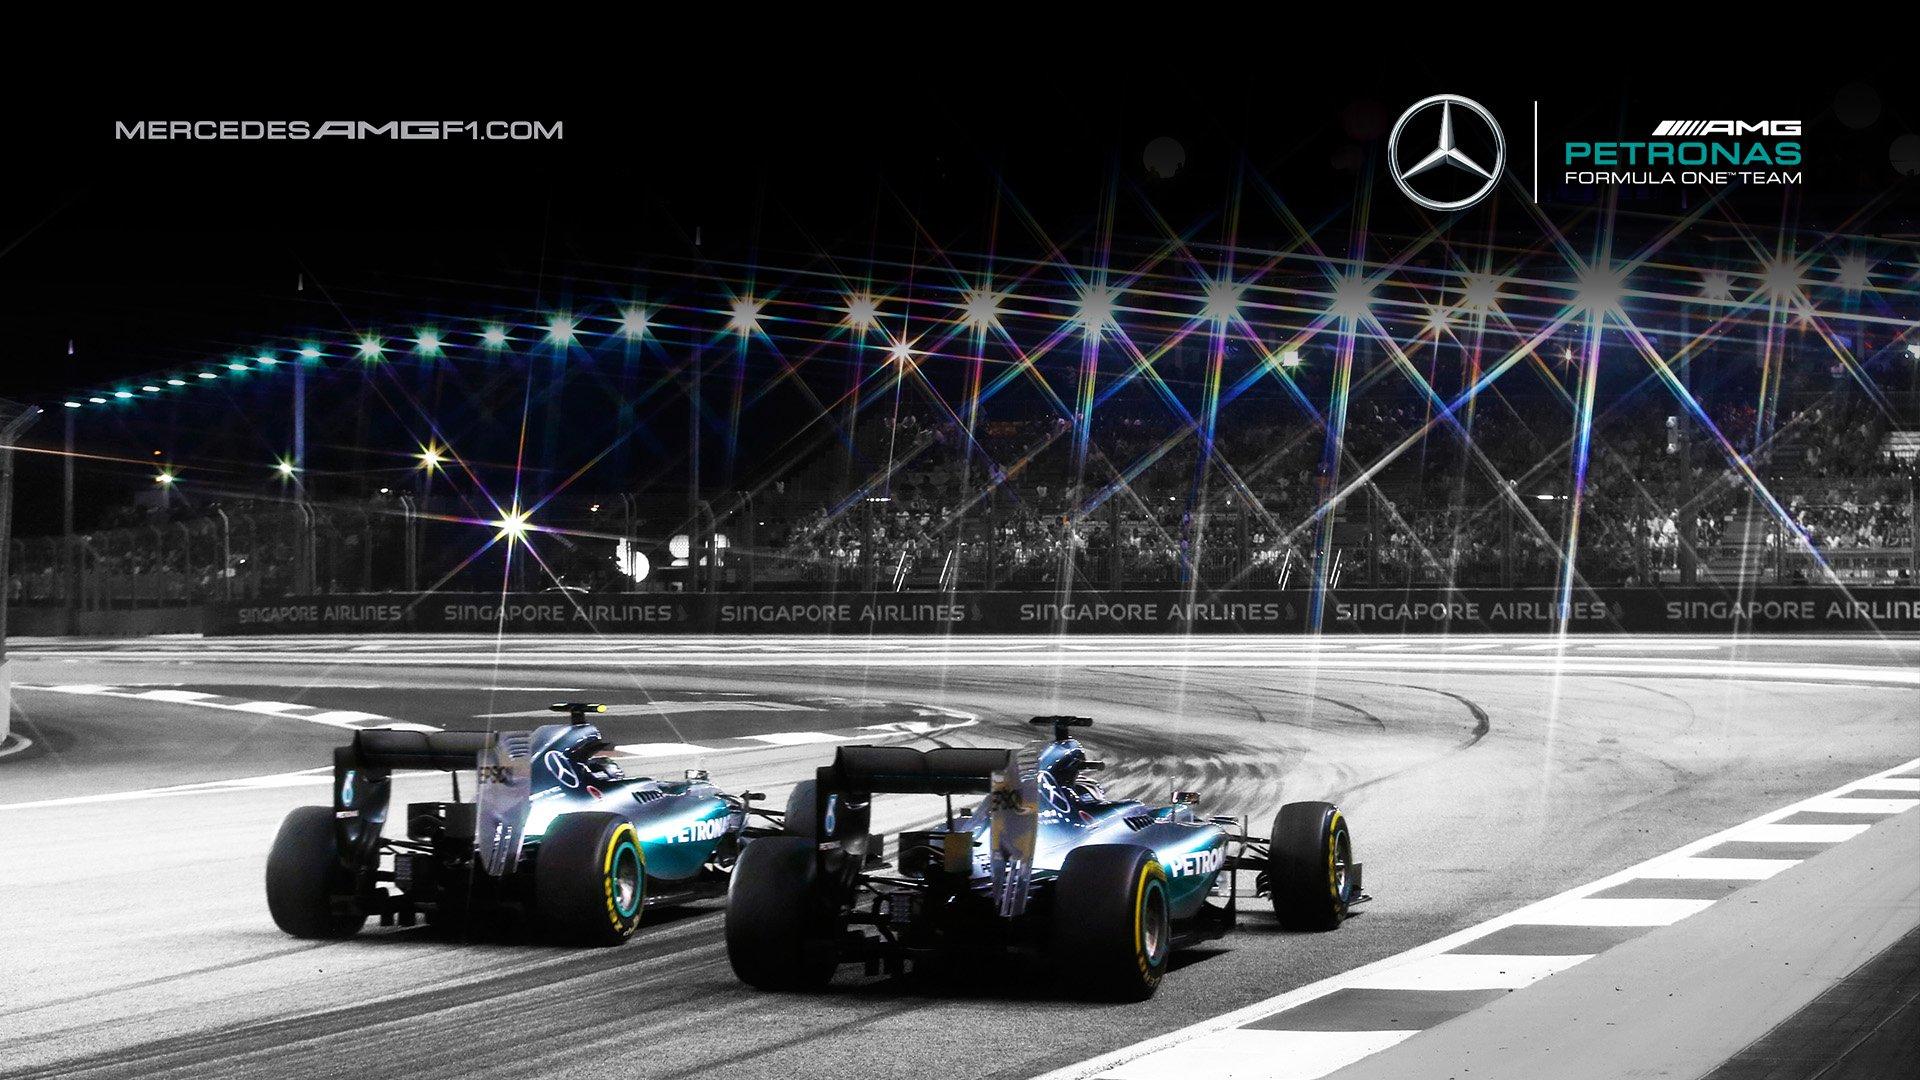 Formula 1 Mercedes F1 Wallpapers HD  Desktop and Mobile